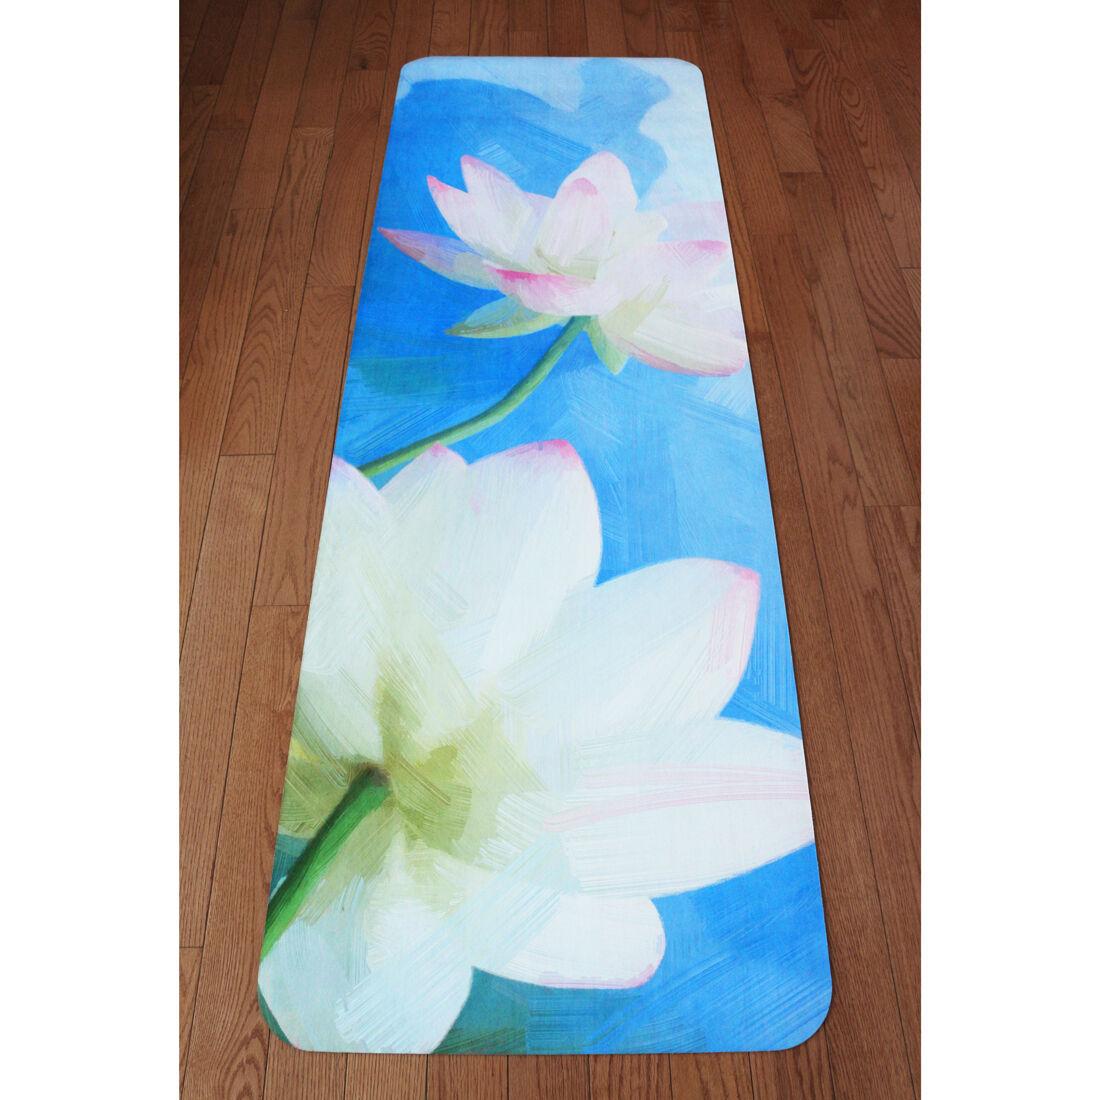 Premium Eco Yoga Mat – Expanding Lotus, Eco Premium Friendly 26214a